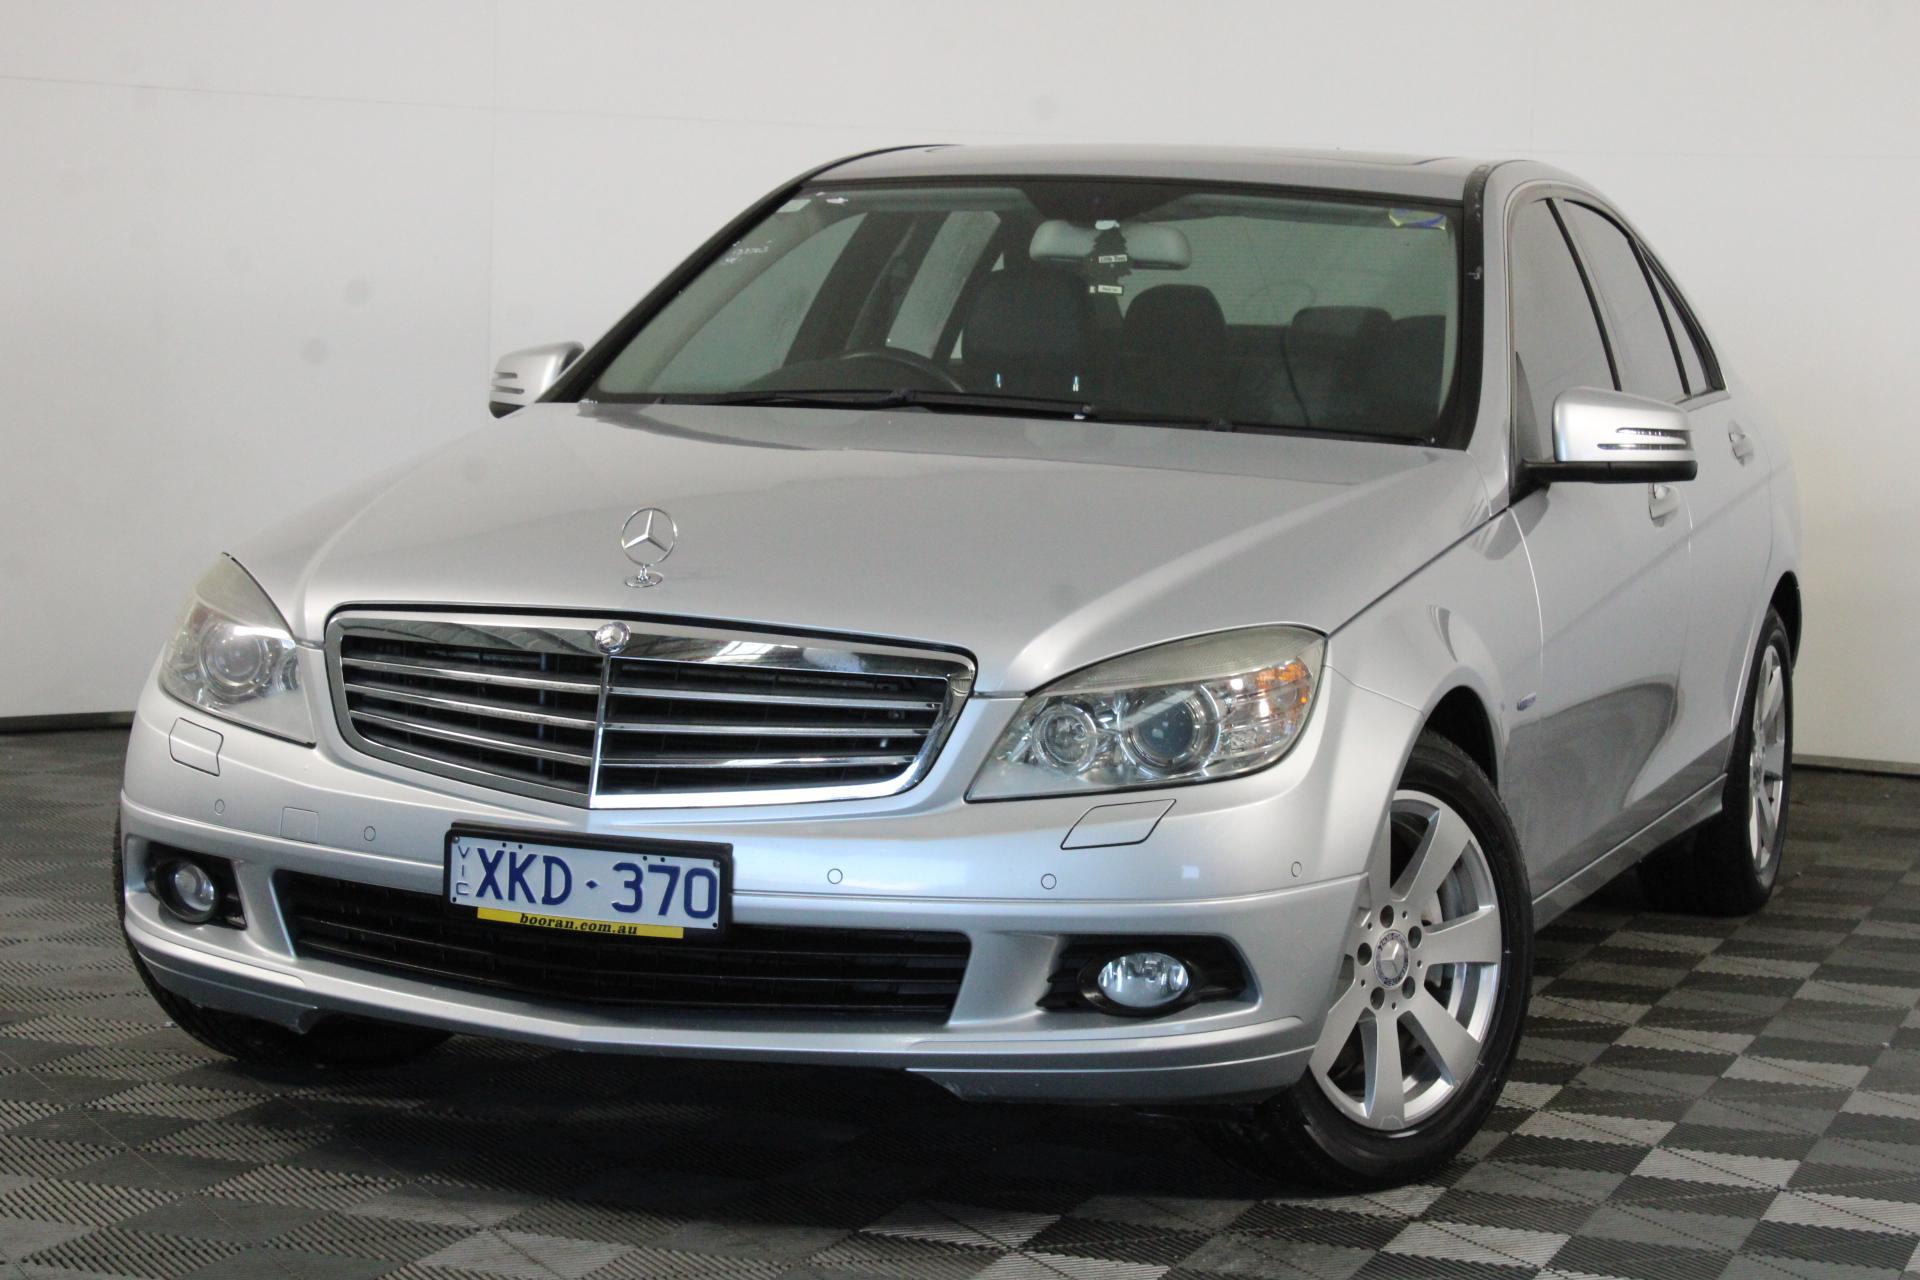 2009 Mercedes Benz C220 CDI Classic W204 Turbo Diesel Automatic Sedan